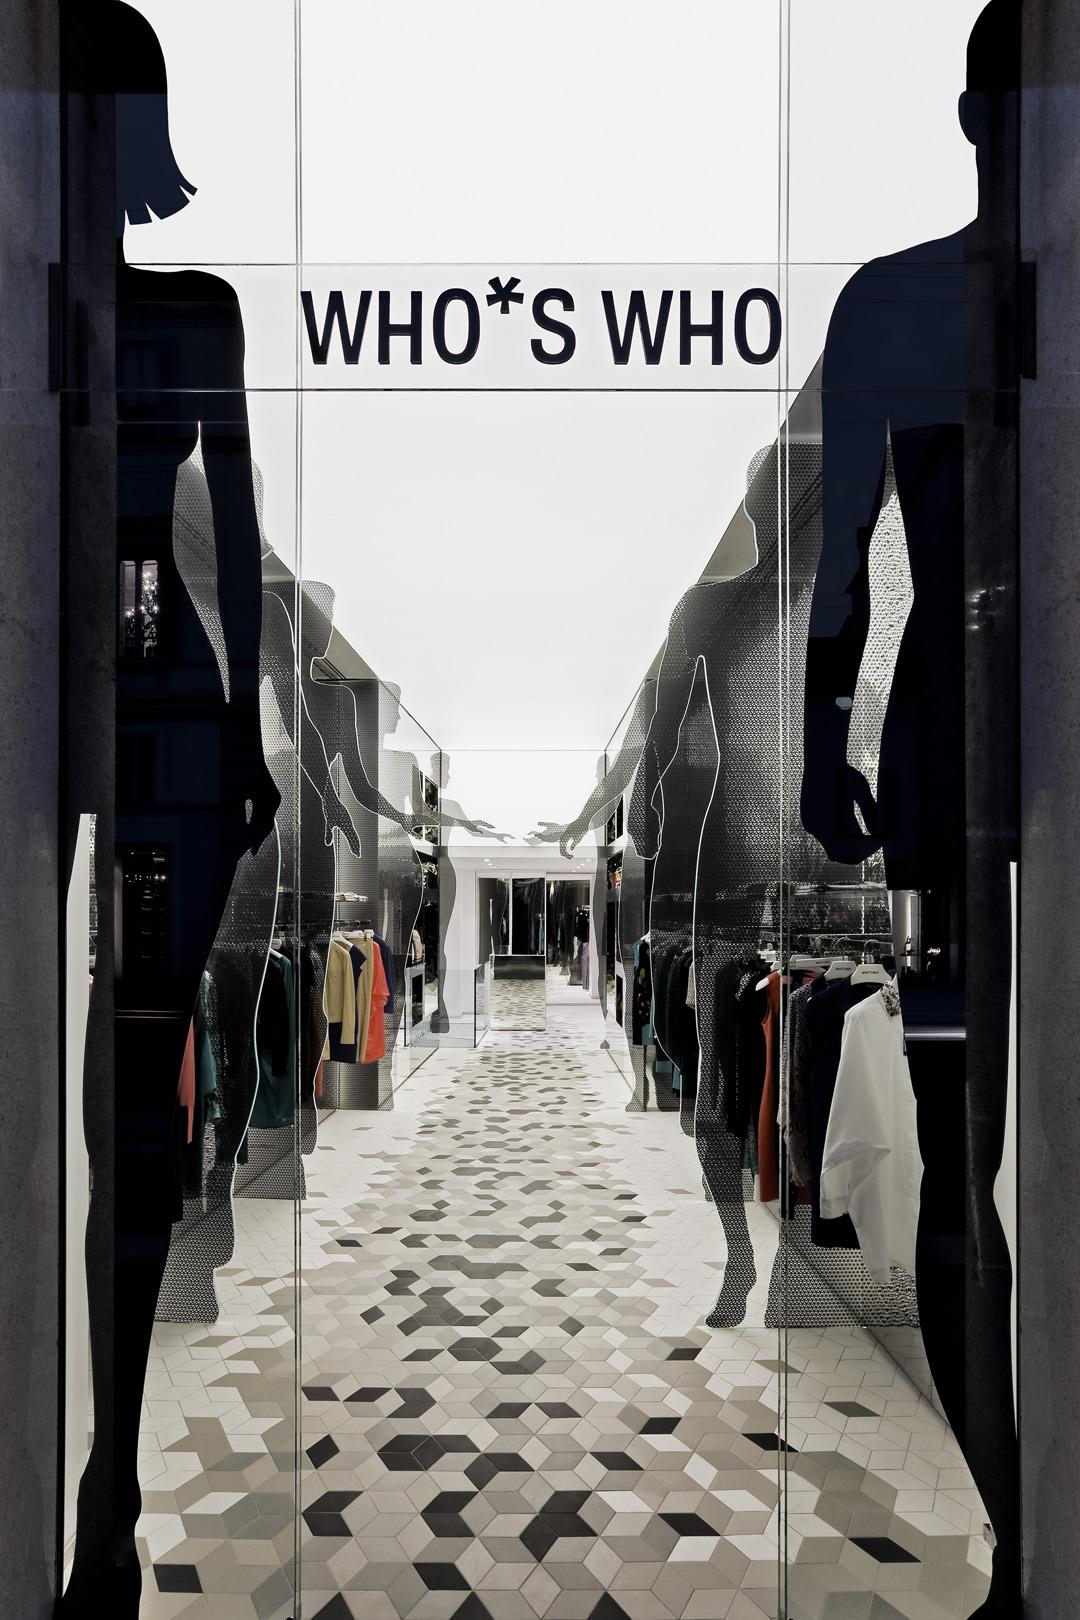 https://www.pasqualeformisano.com/wp-content/uploads/2016/11/Who_S_Who_01.jpg